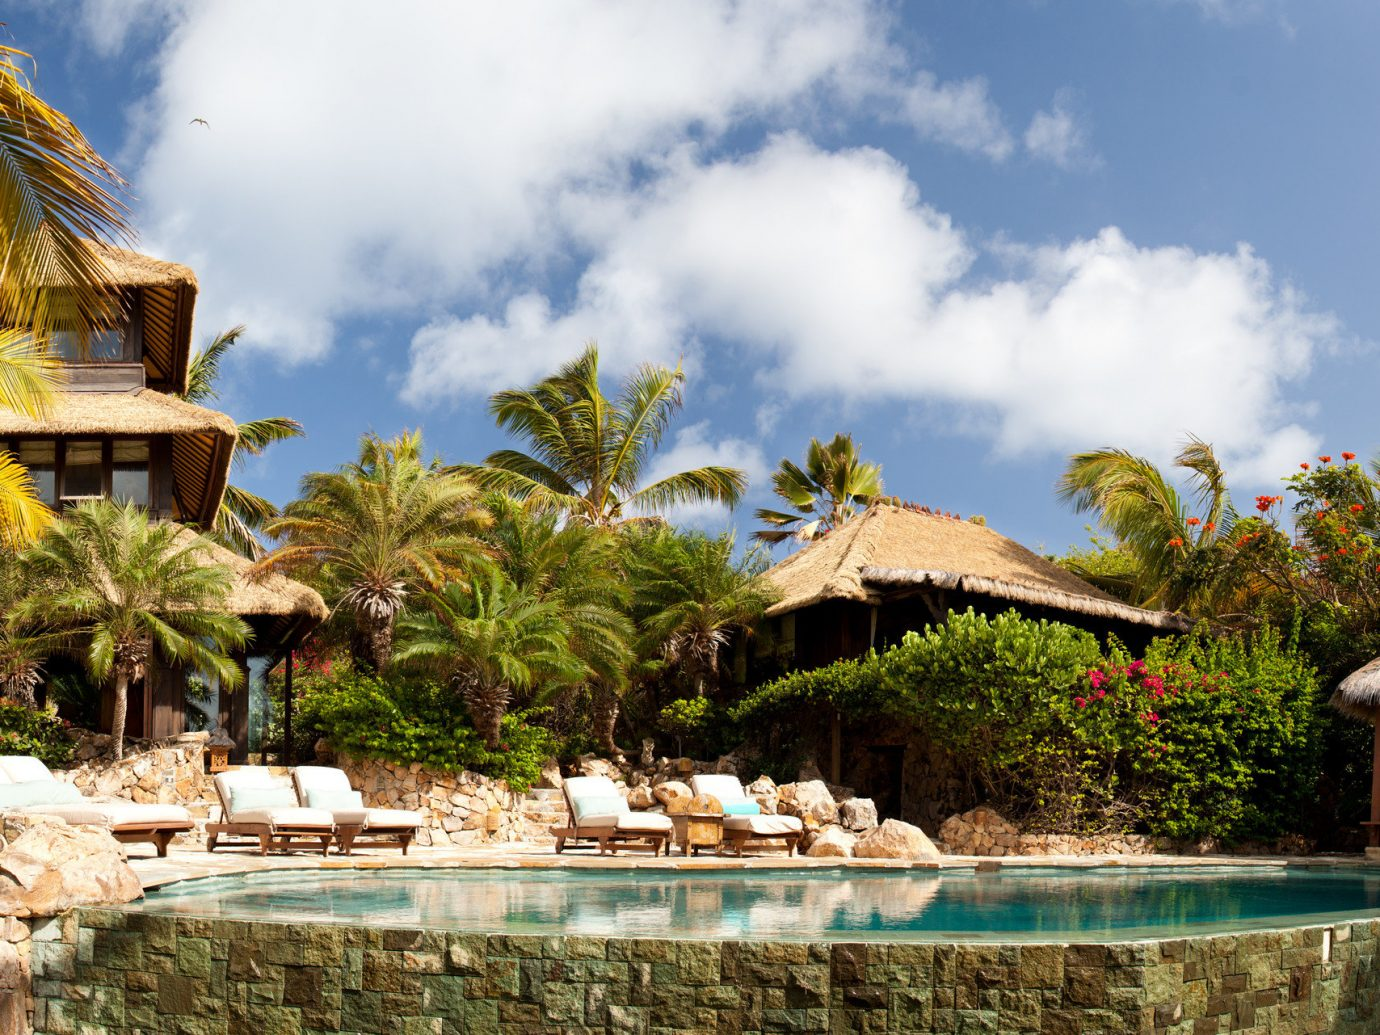 Trip Ideas outdoor tree sky estate Resort vacation arecales tourism tropics Village Jungle flower palm plant area Garden